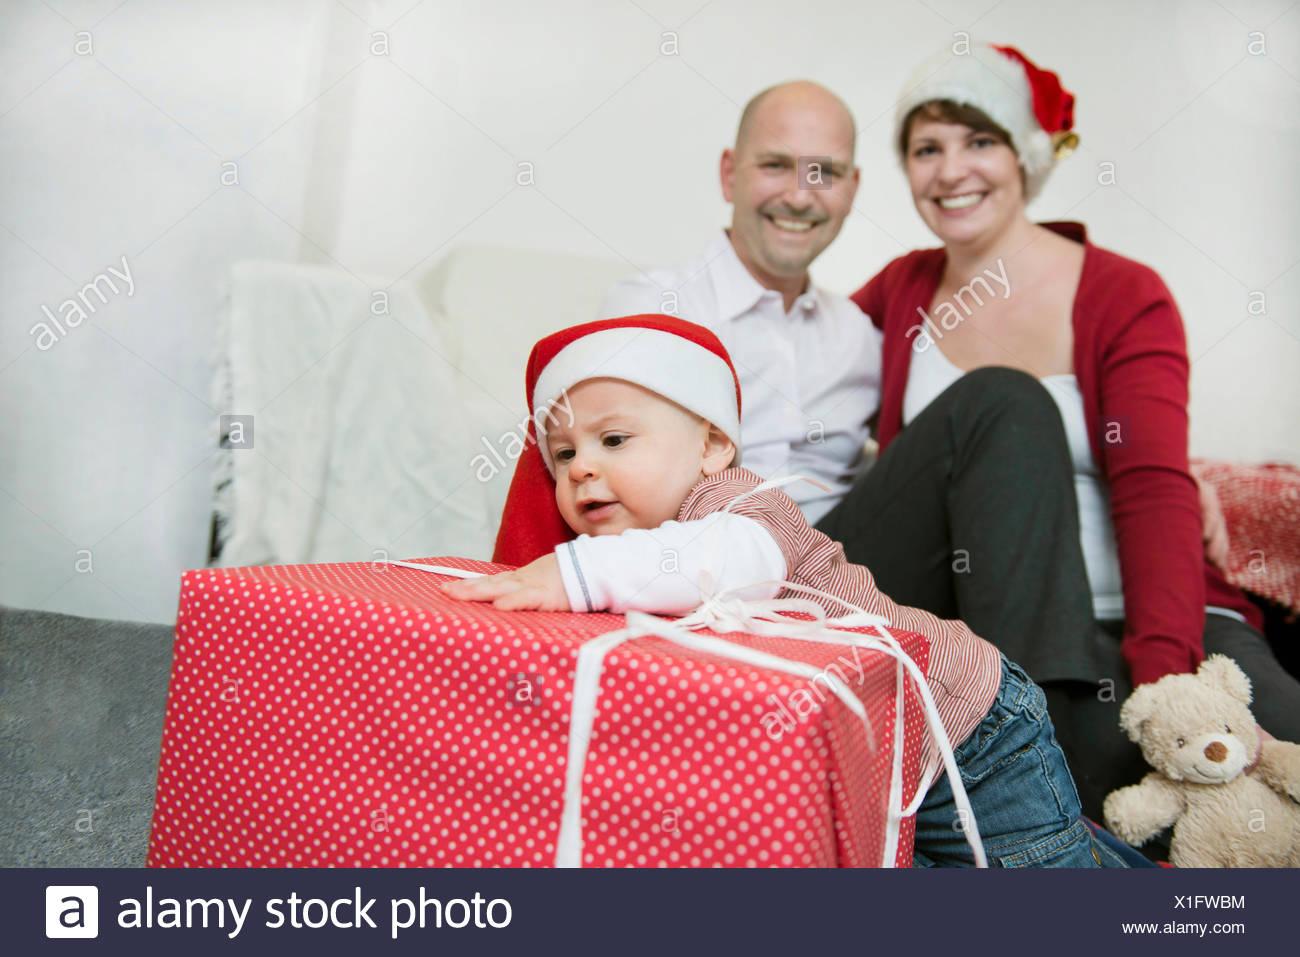 Family celebrating Christmas with Christmas caps and Christmas present - Stock Image